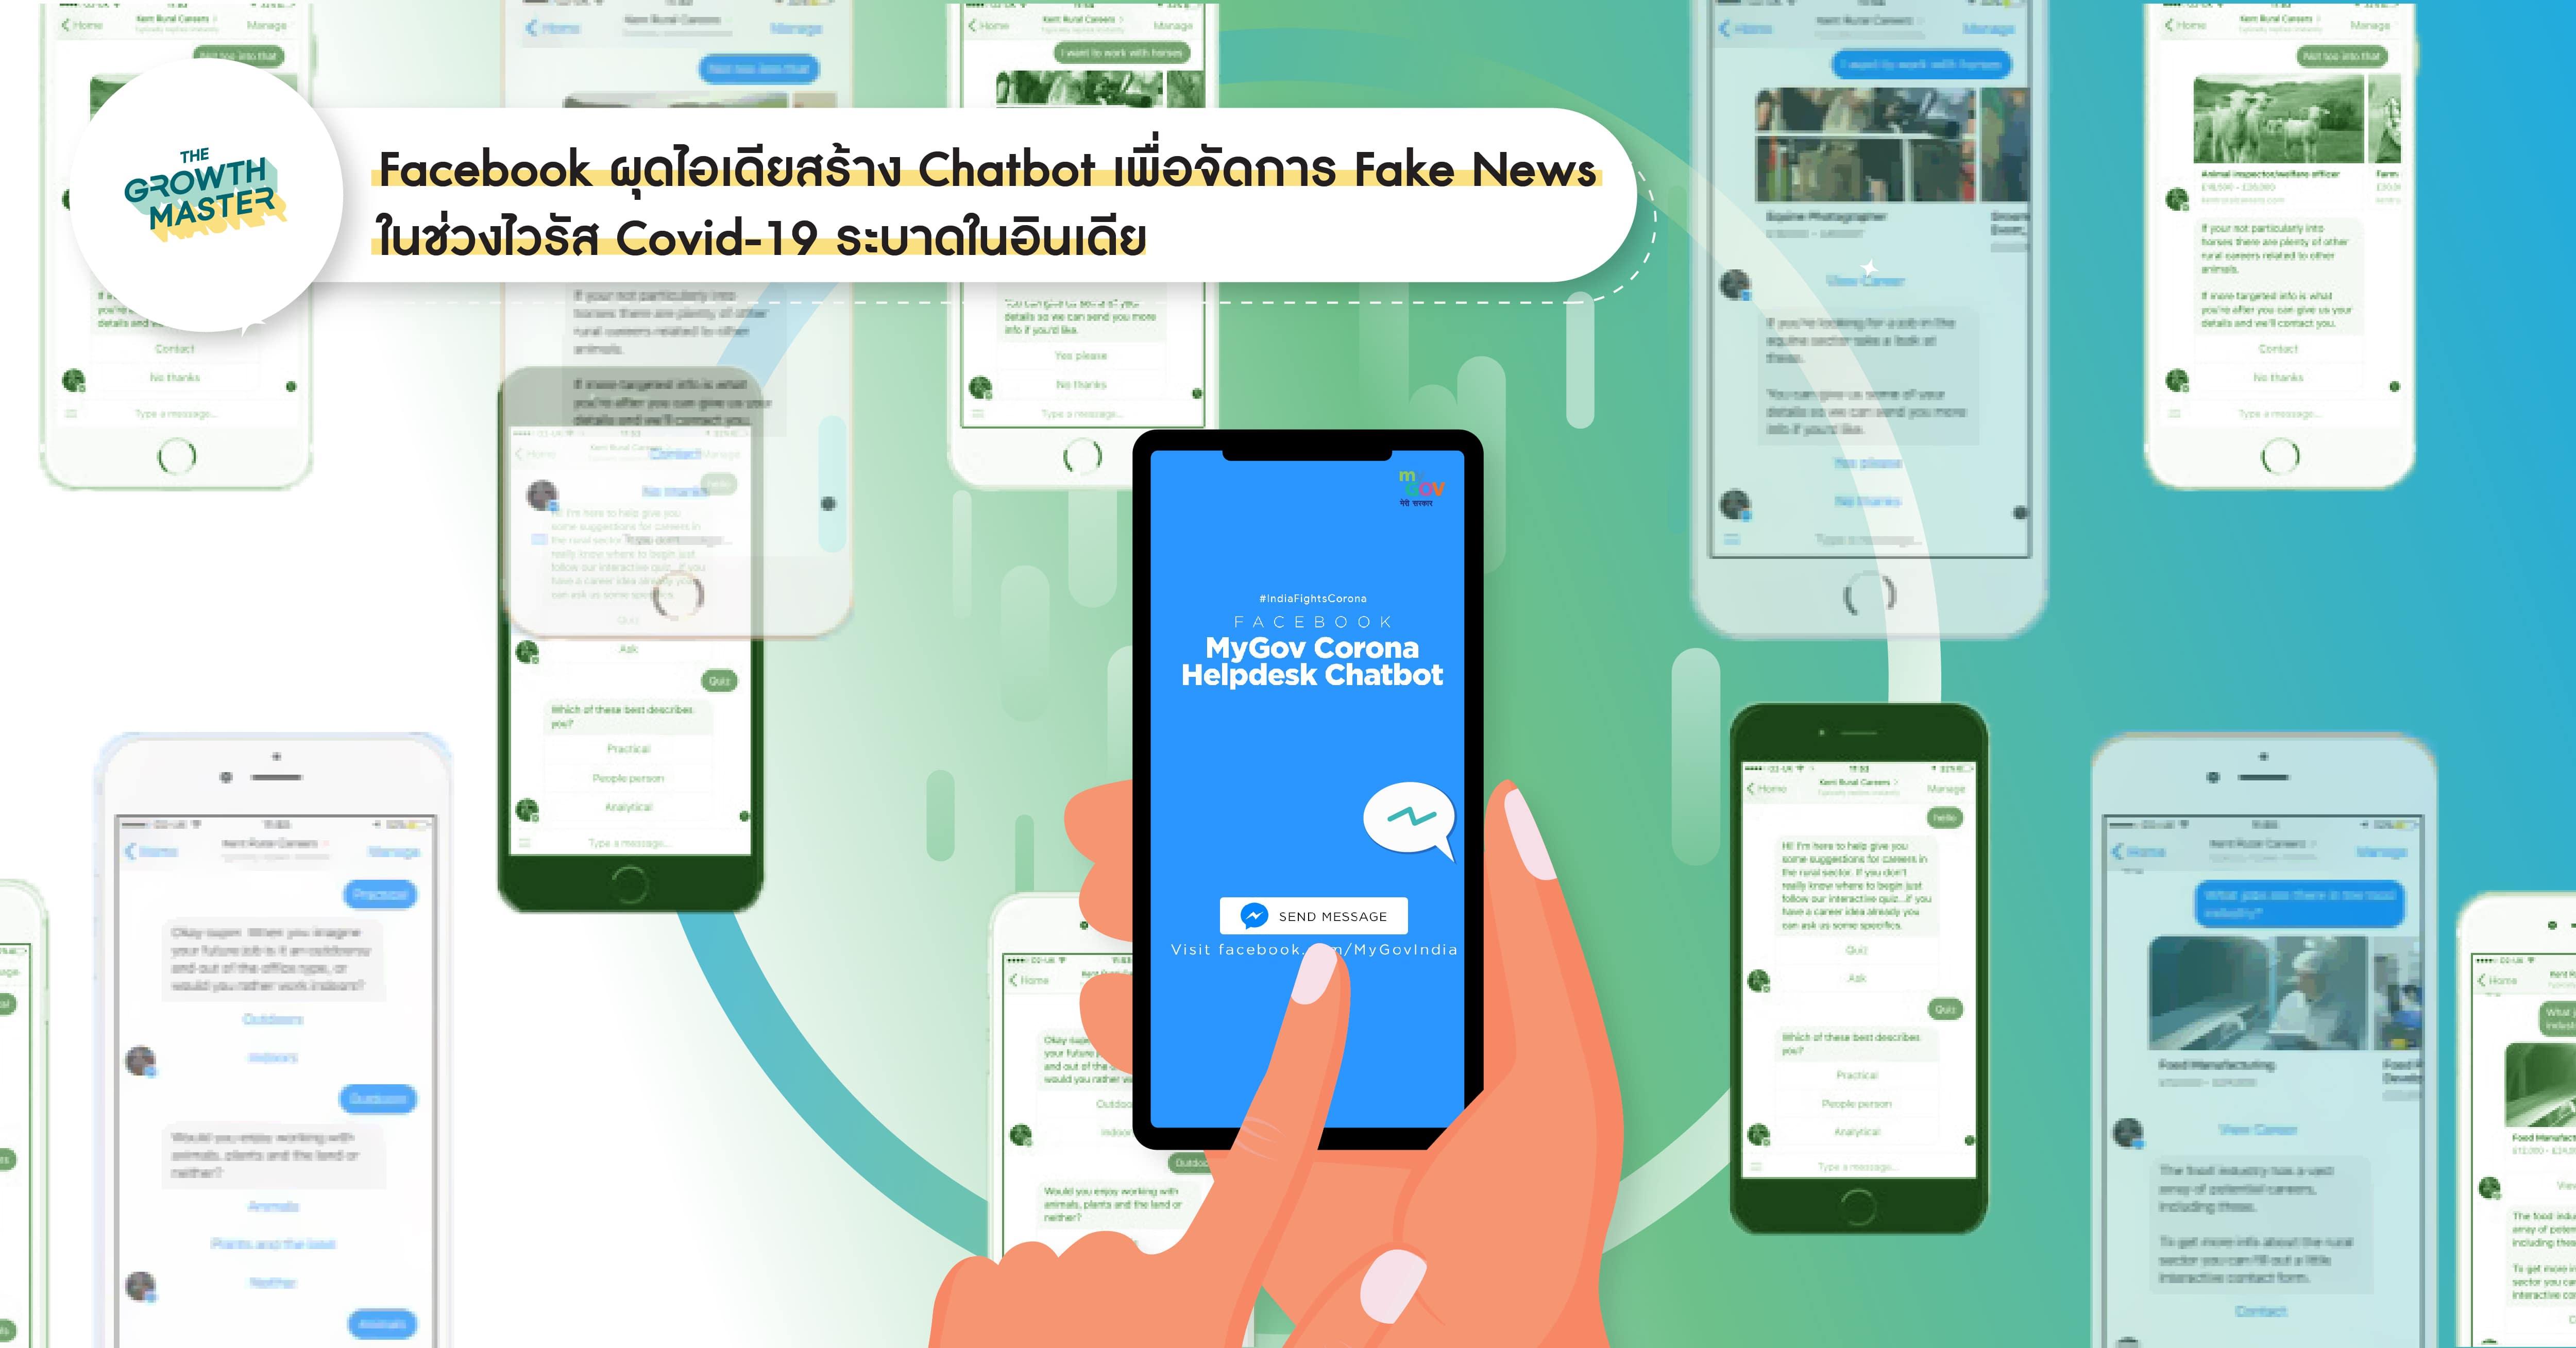 Facebook ผุดไอเดียสร้าง Chatbot เพื่อจัดการ Fake News ในช่วงไวรัส Covid-19 ระบาดในอินเดีย